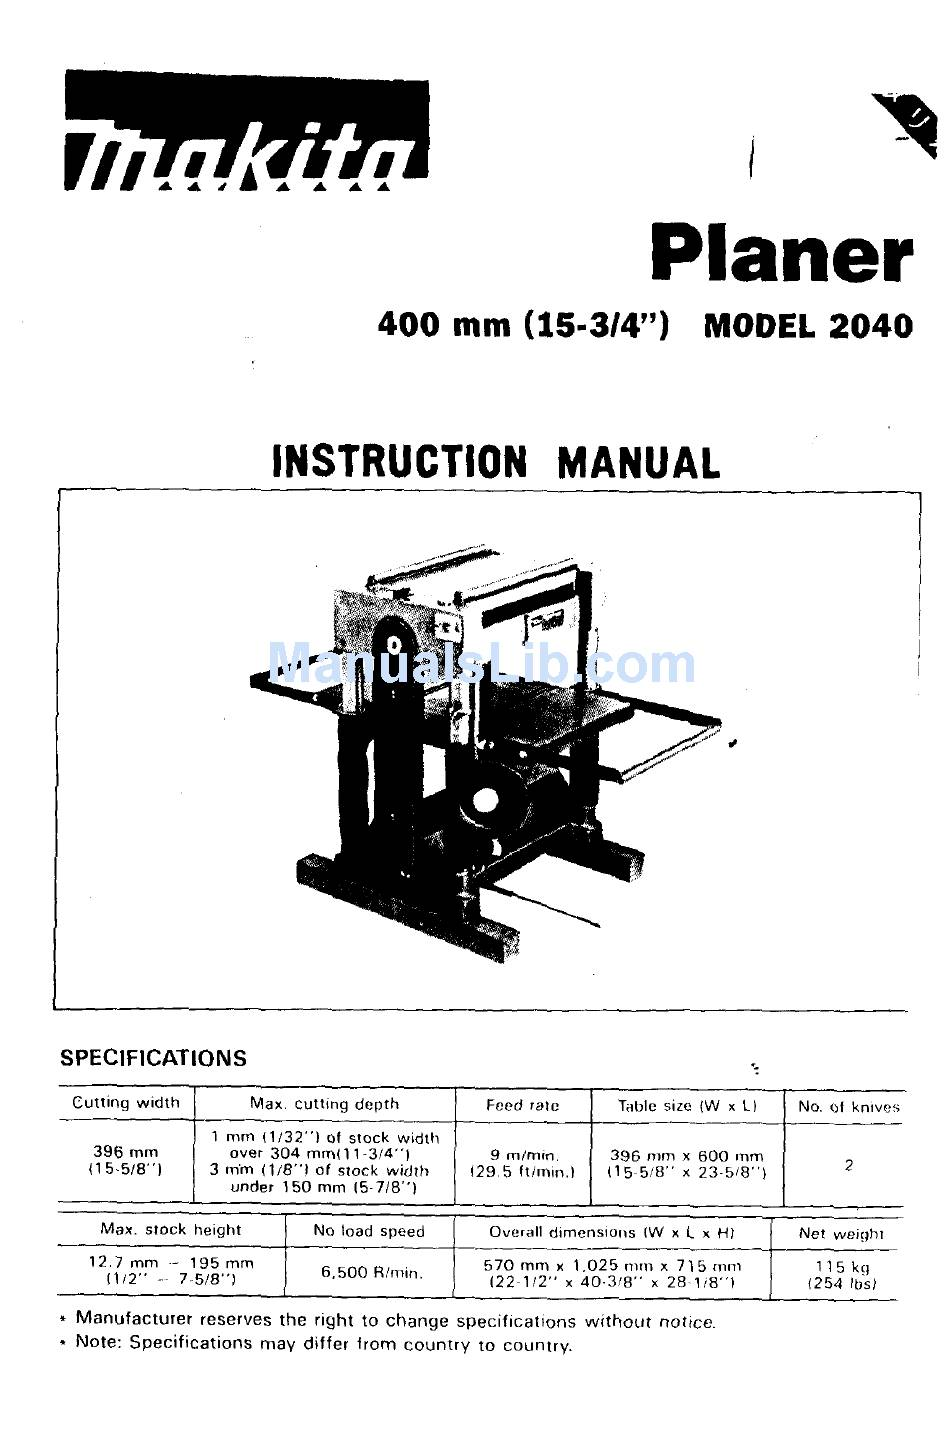 Makita Planer 2040 Instruction Manual Pdf Download